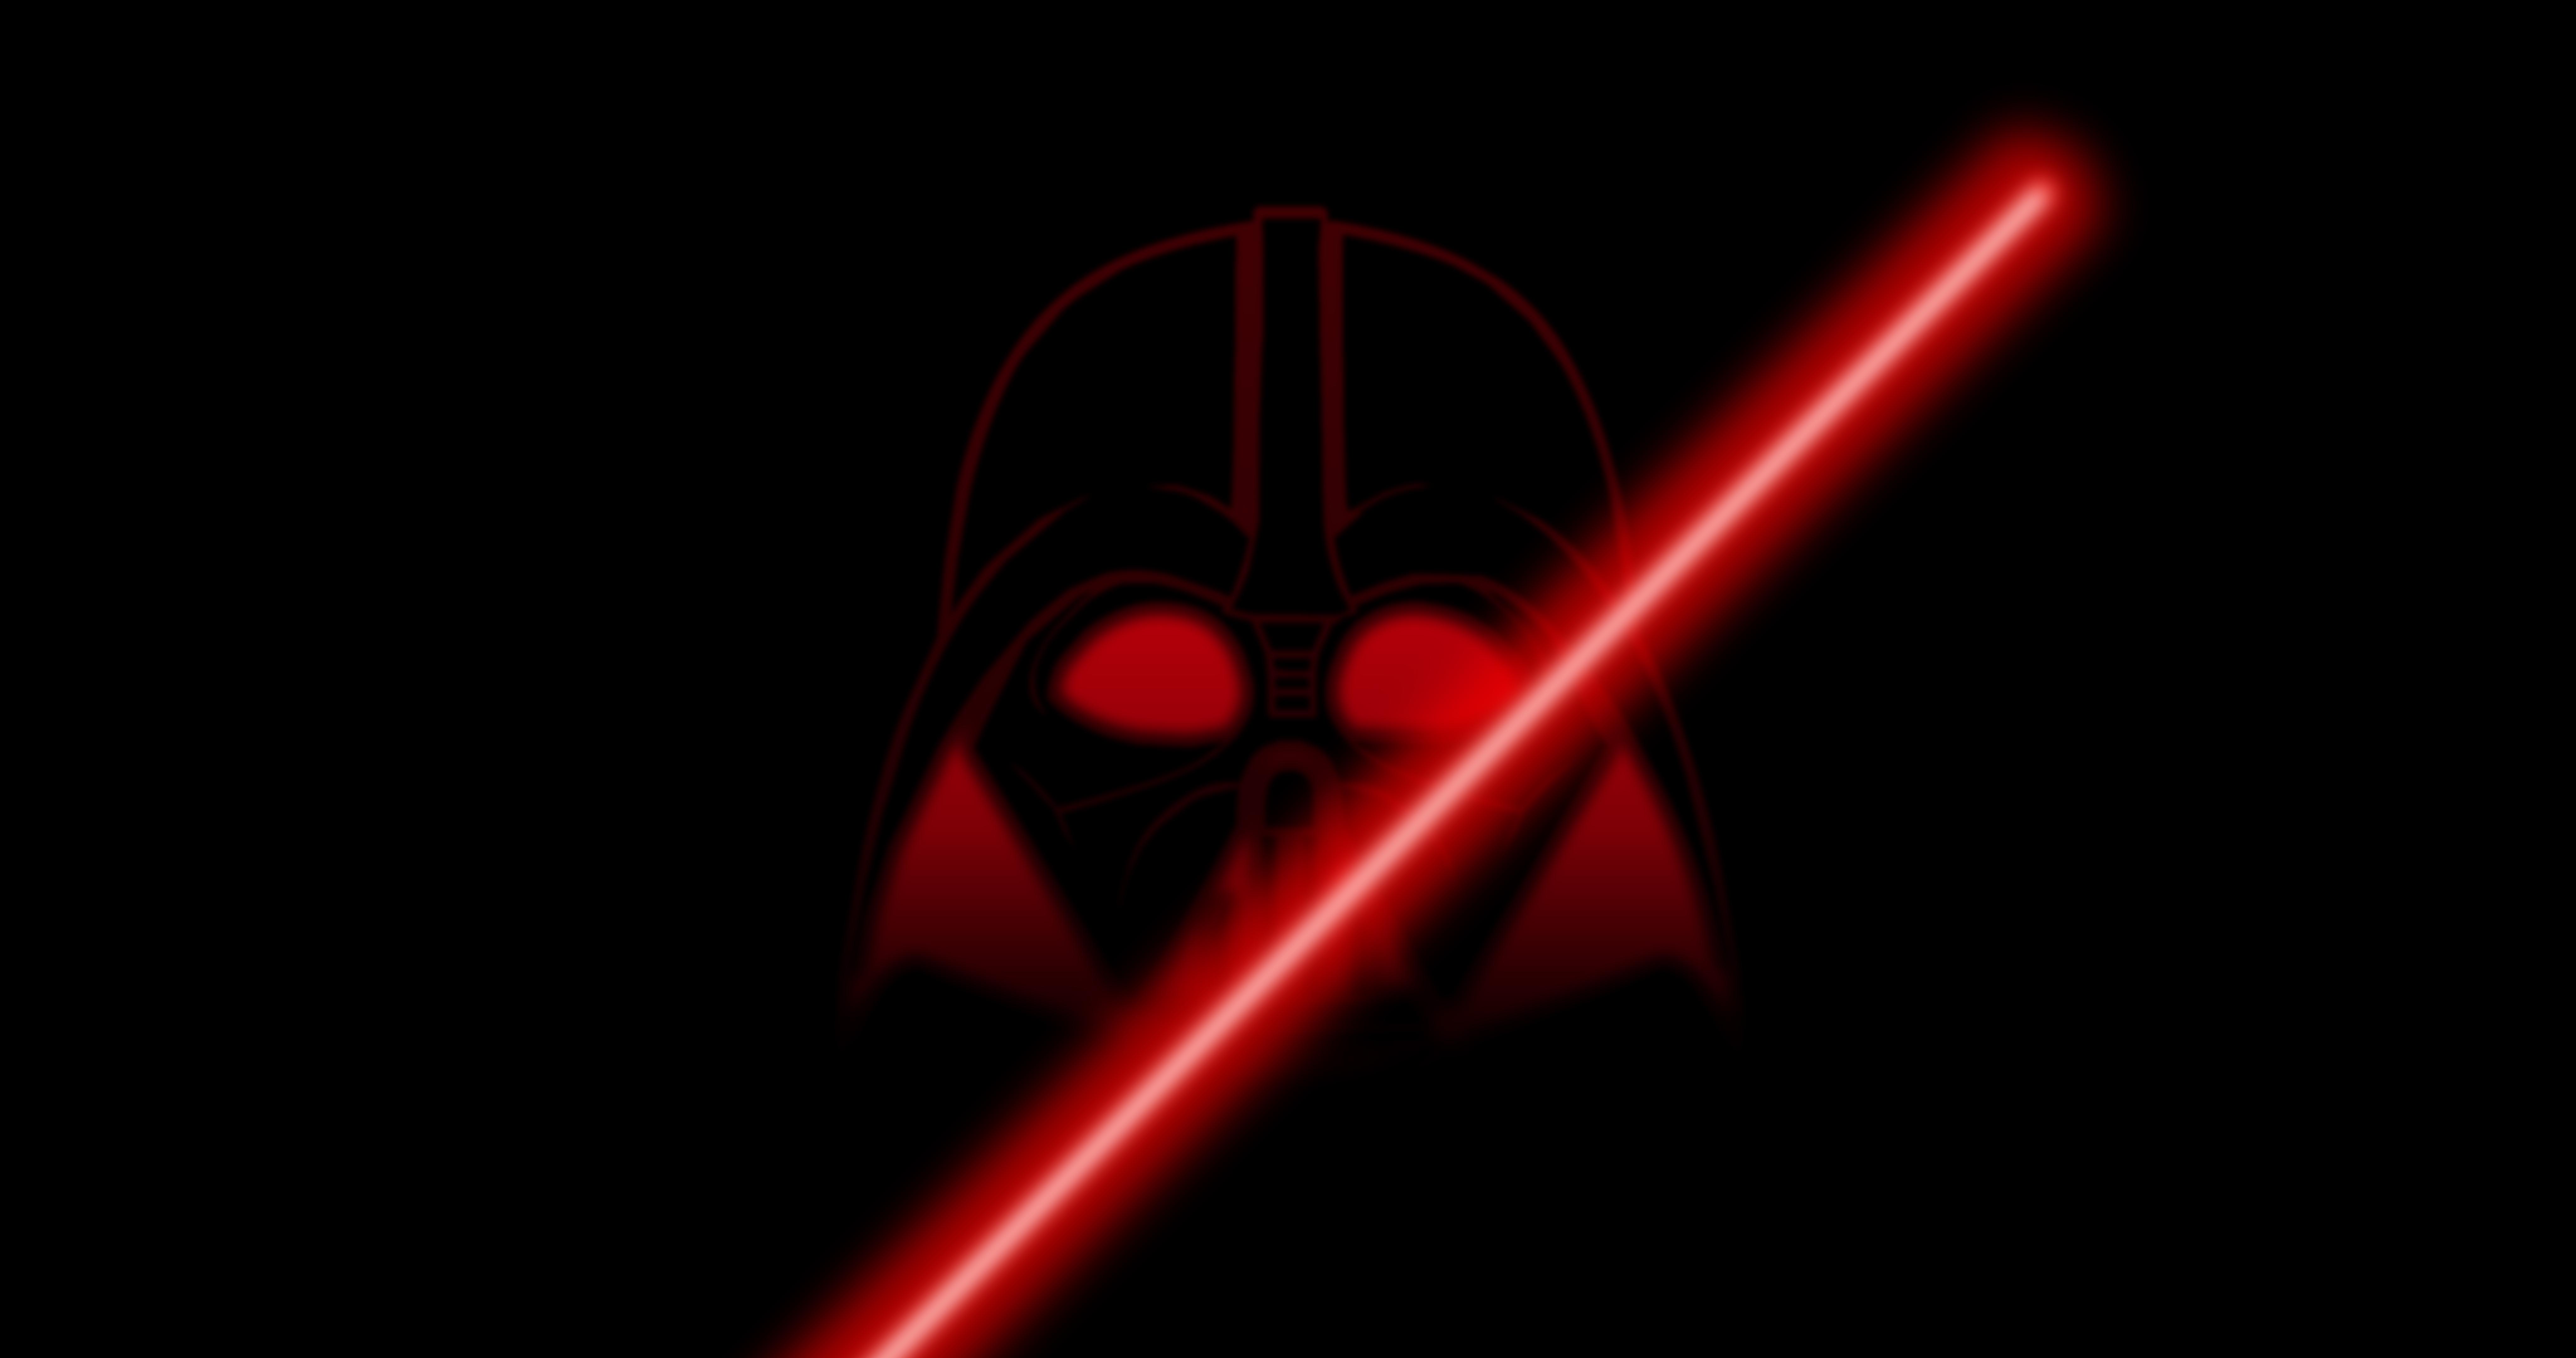 Wallpaper Star Wars Darth Vader Red Black Simple Background Sword Lightsaber Helmet Dark 8192x4320 Glorioushercules 1873029 Hd Wallpapers Wallhere